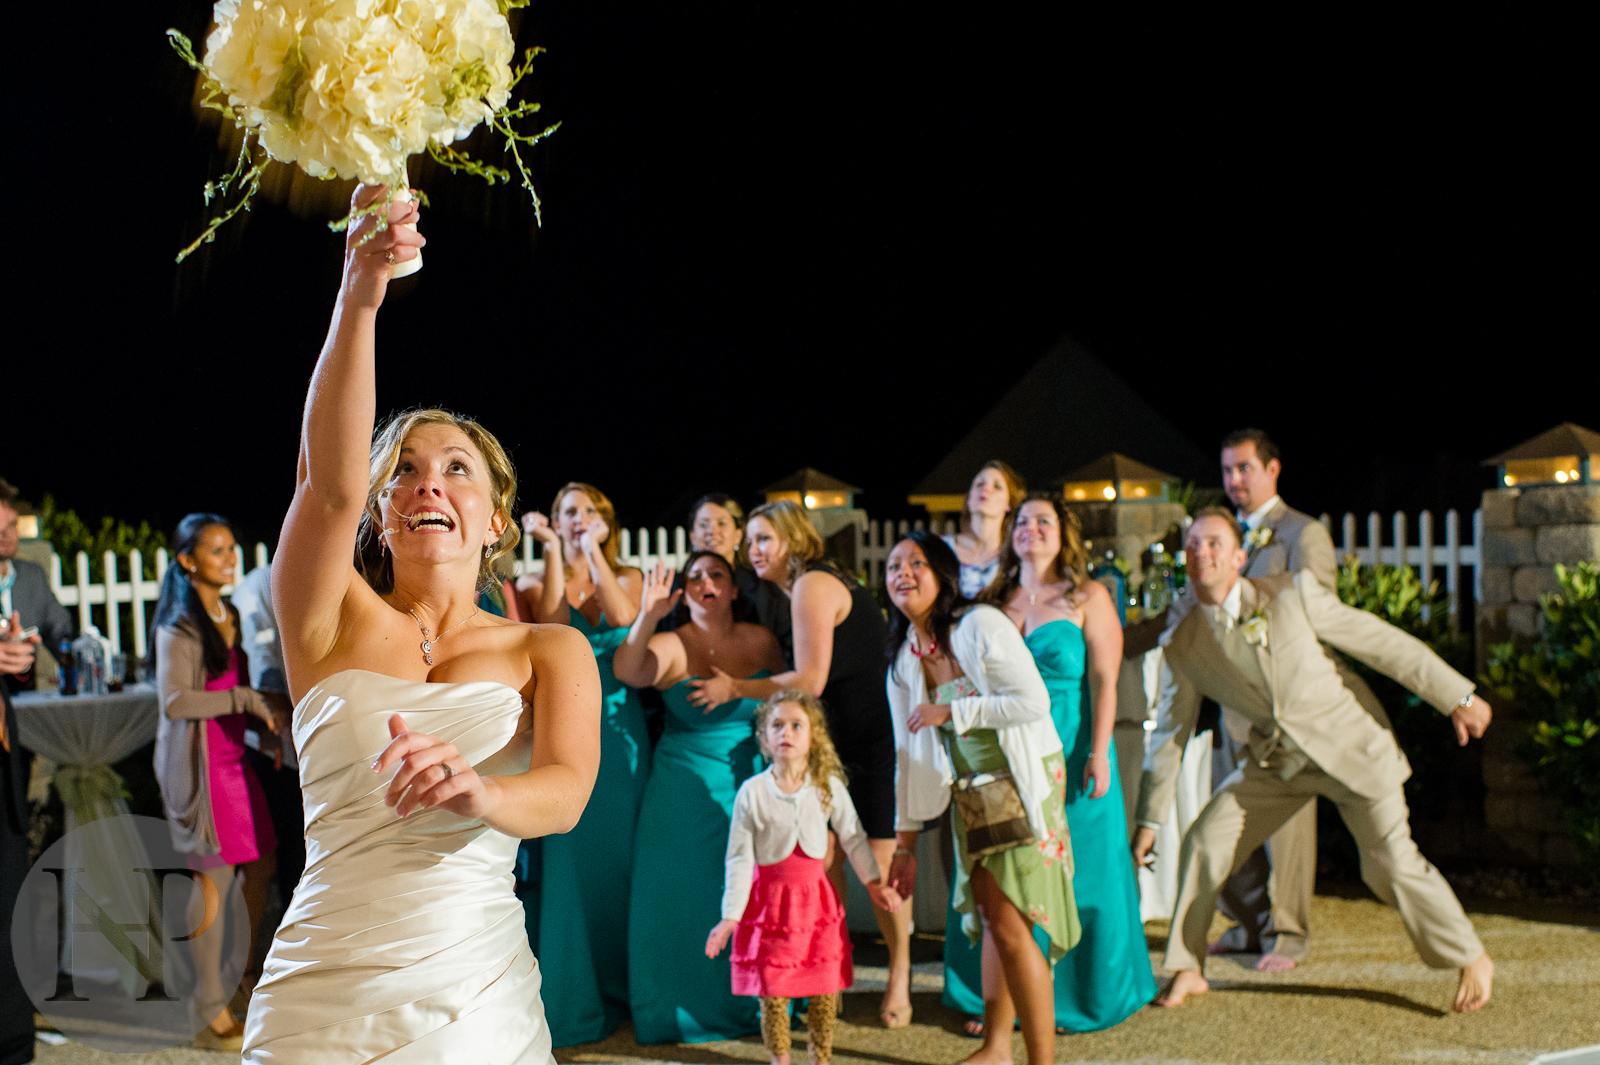 wedding photography dc photographer - district of columbia photography weddingphoto 2012_ denis kaleigh - north carolina - emerald isle - destination wedding-76.jpg